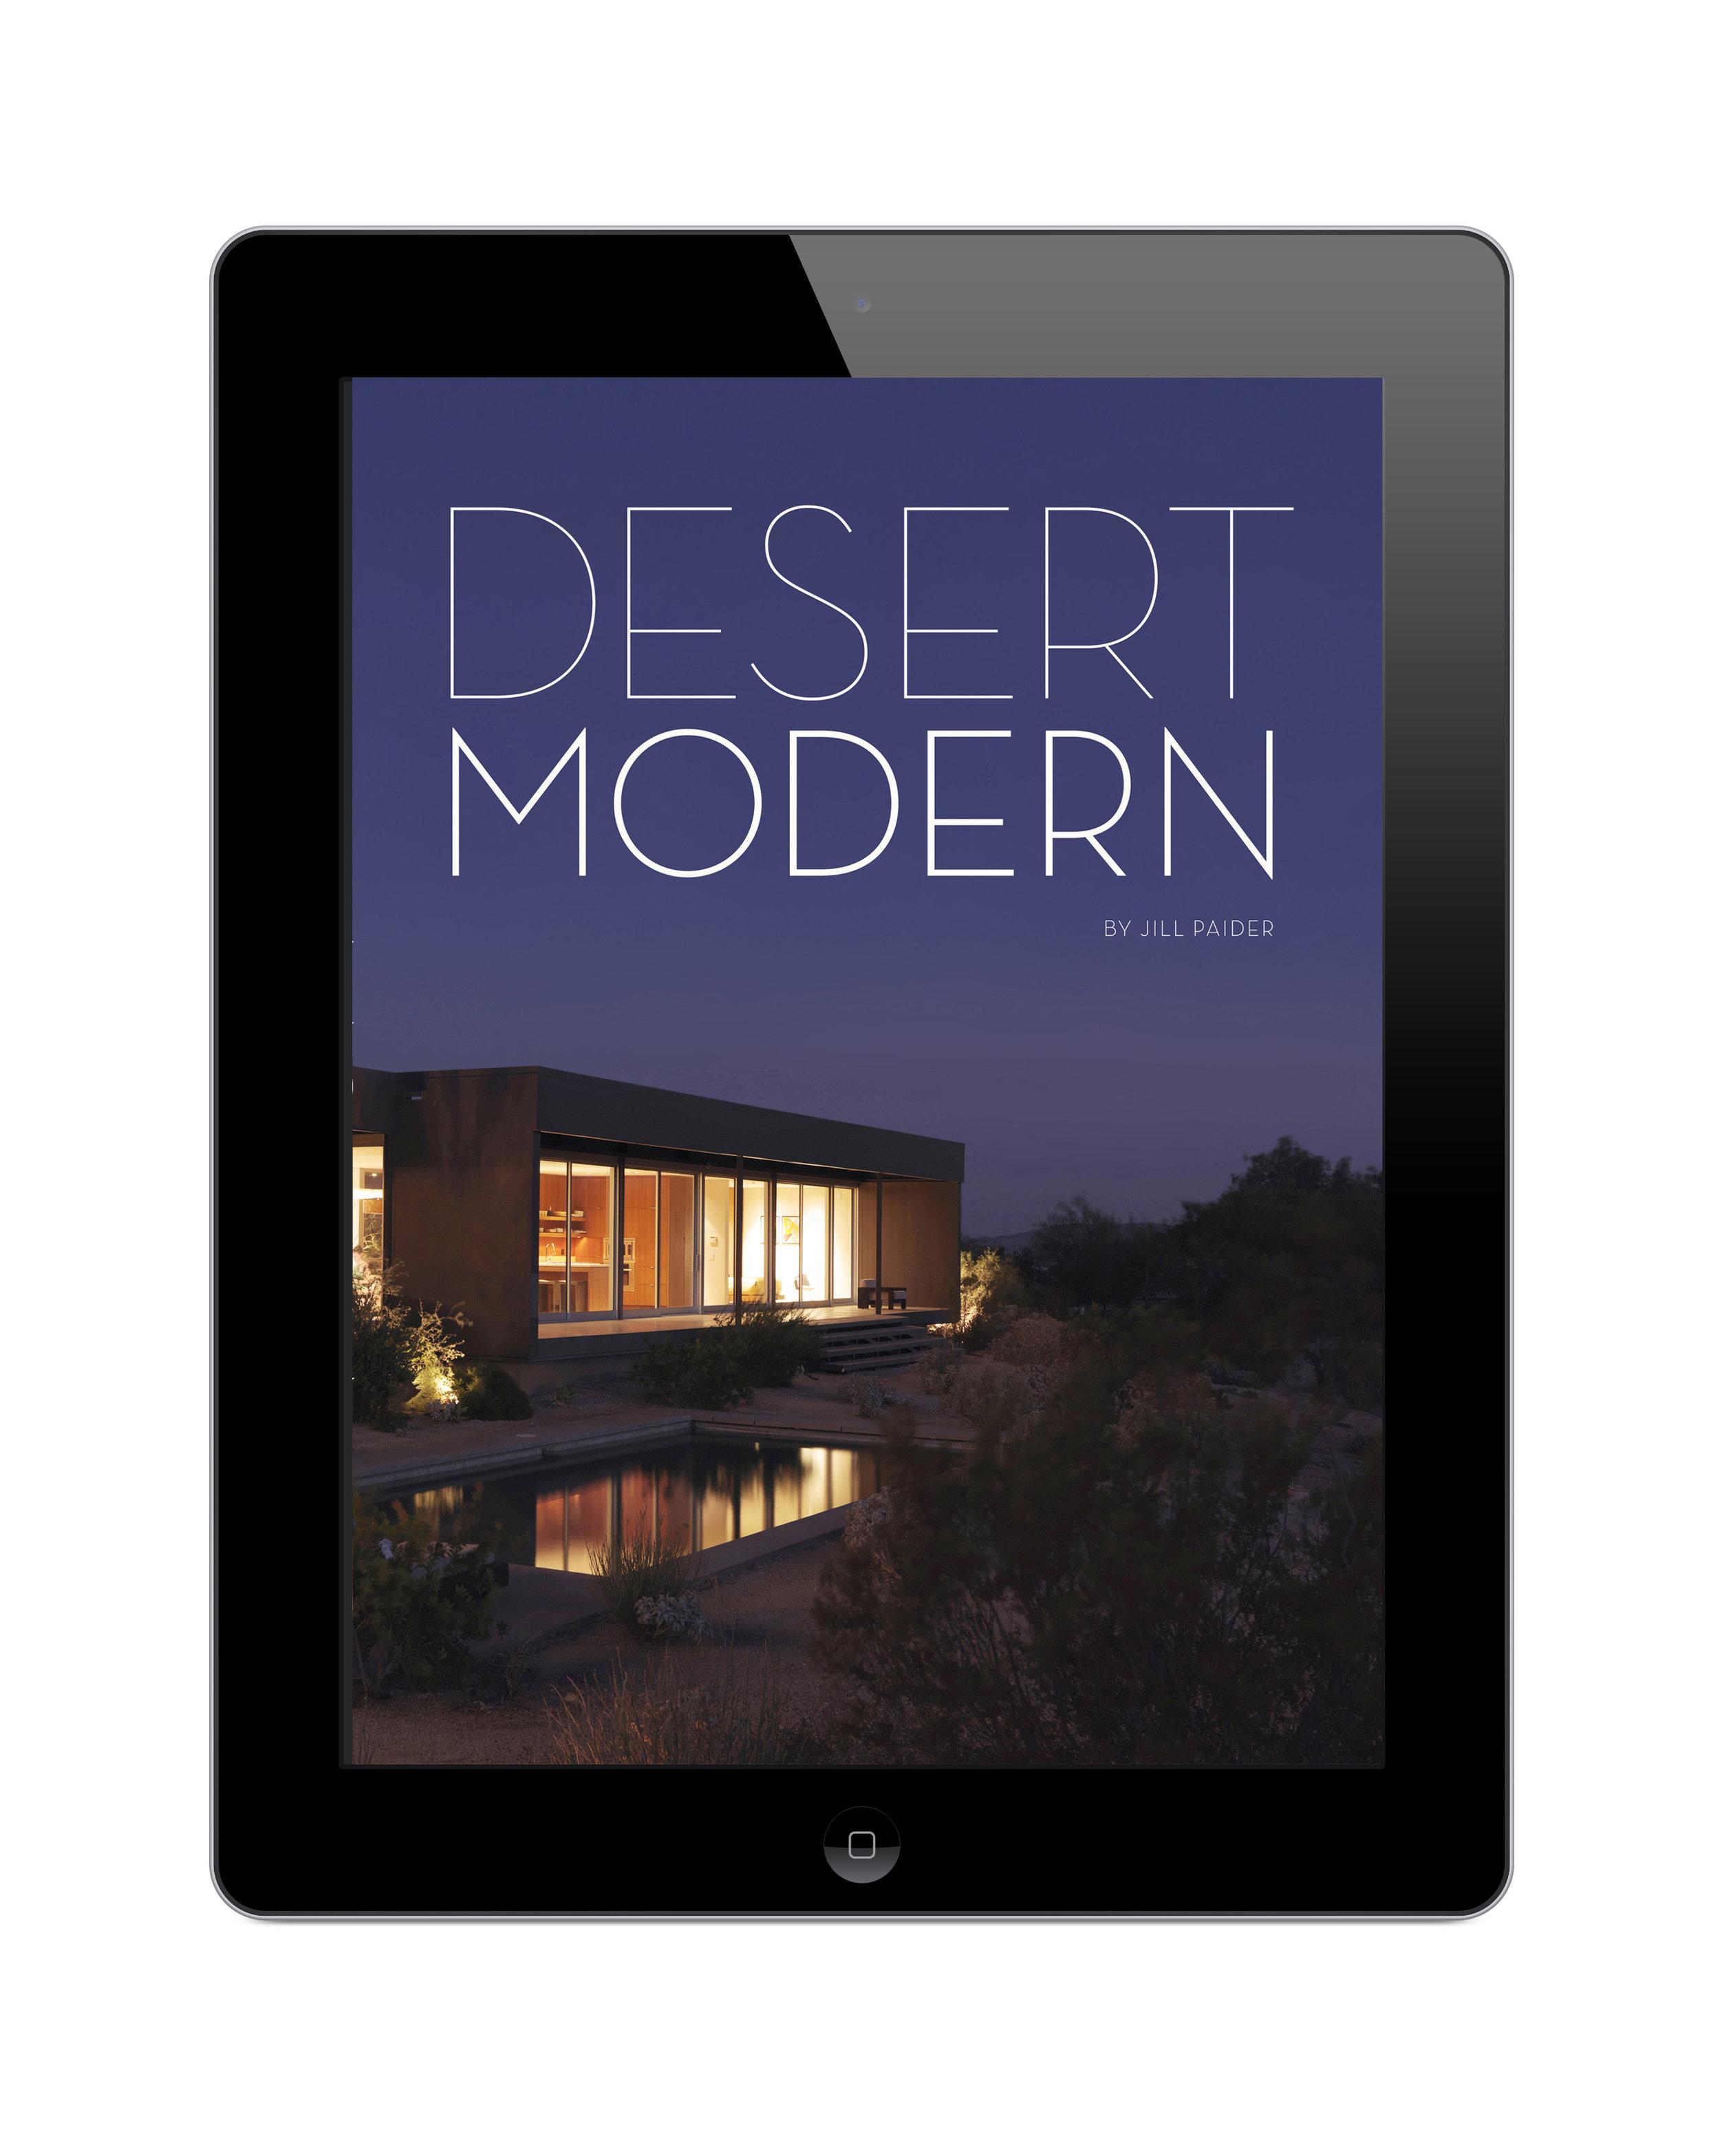 DESERT MODERN - DIGITAL EDITION